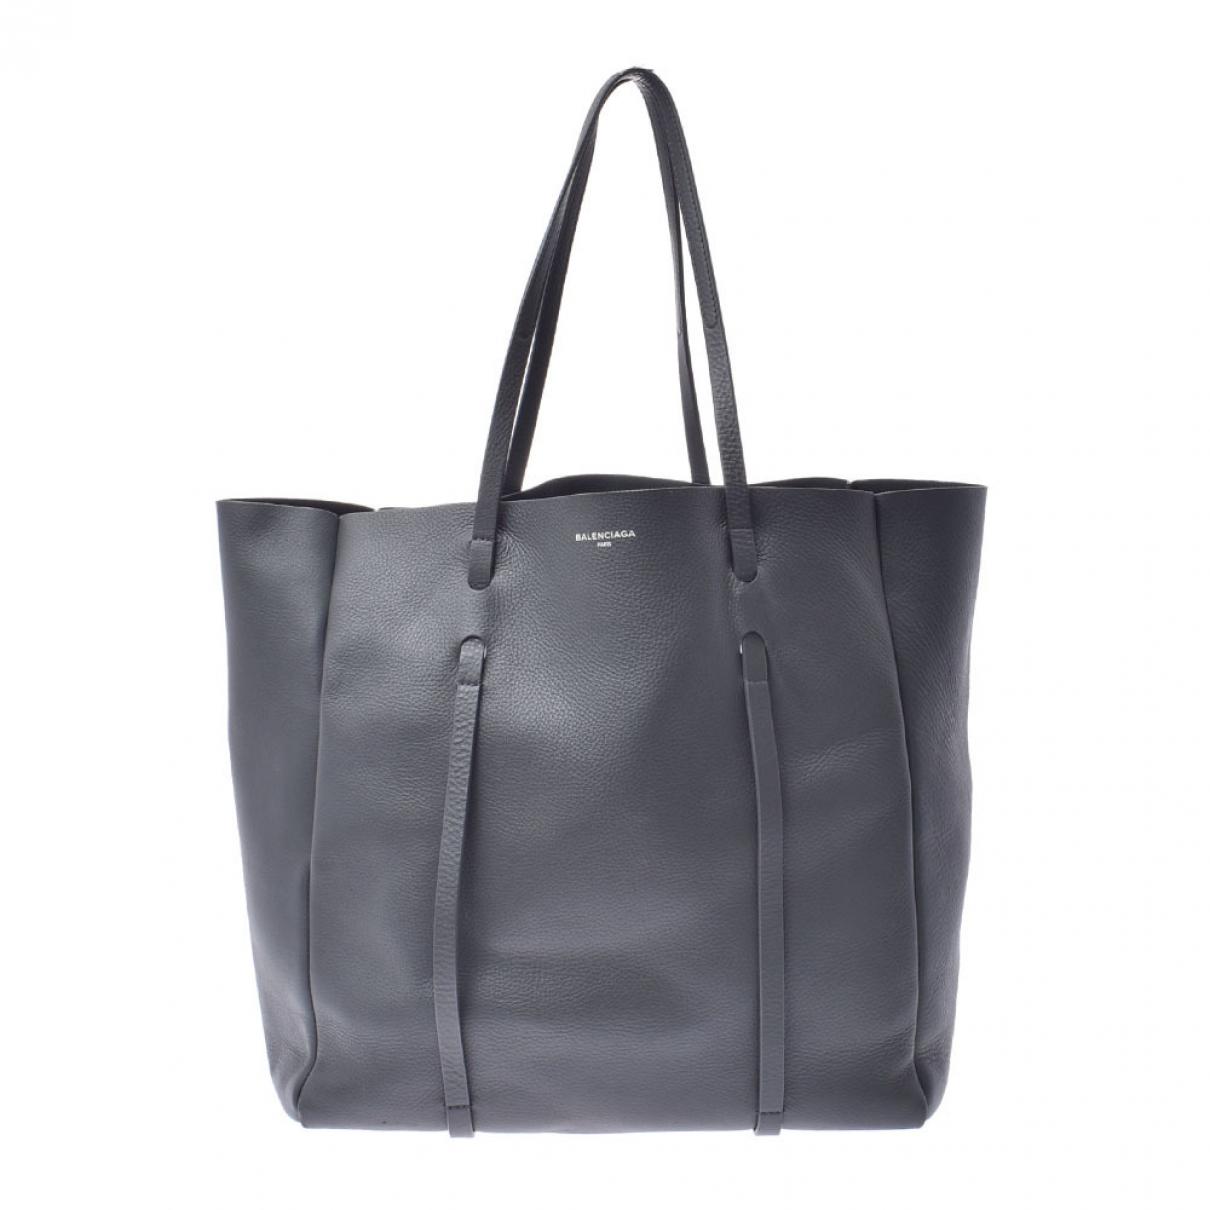 Balenciaga Eveyday Cabas Handtasche in  Grau Leder